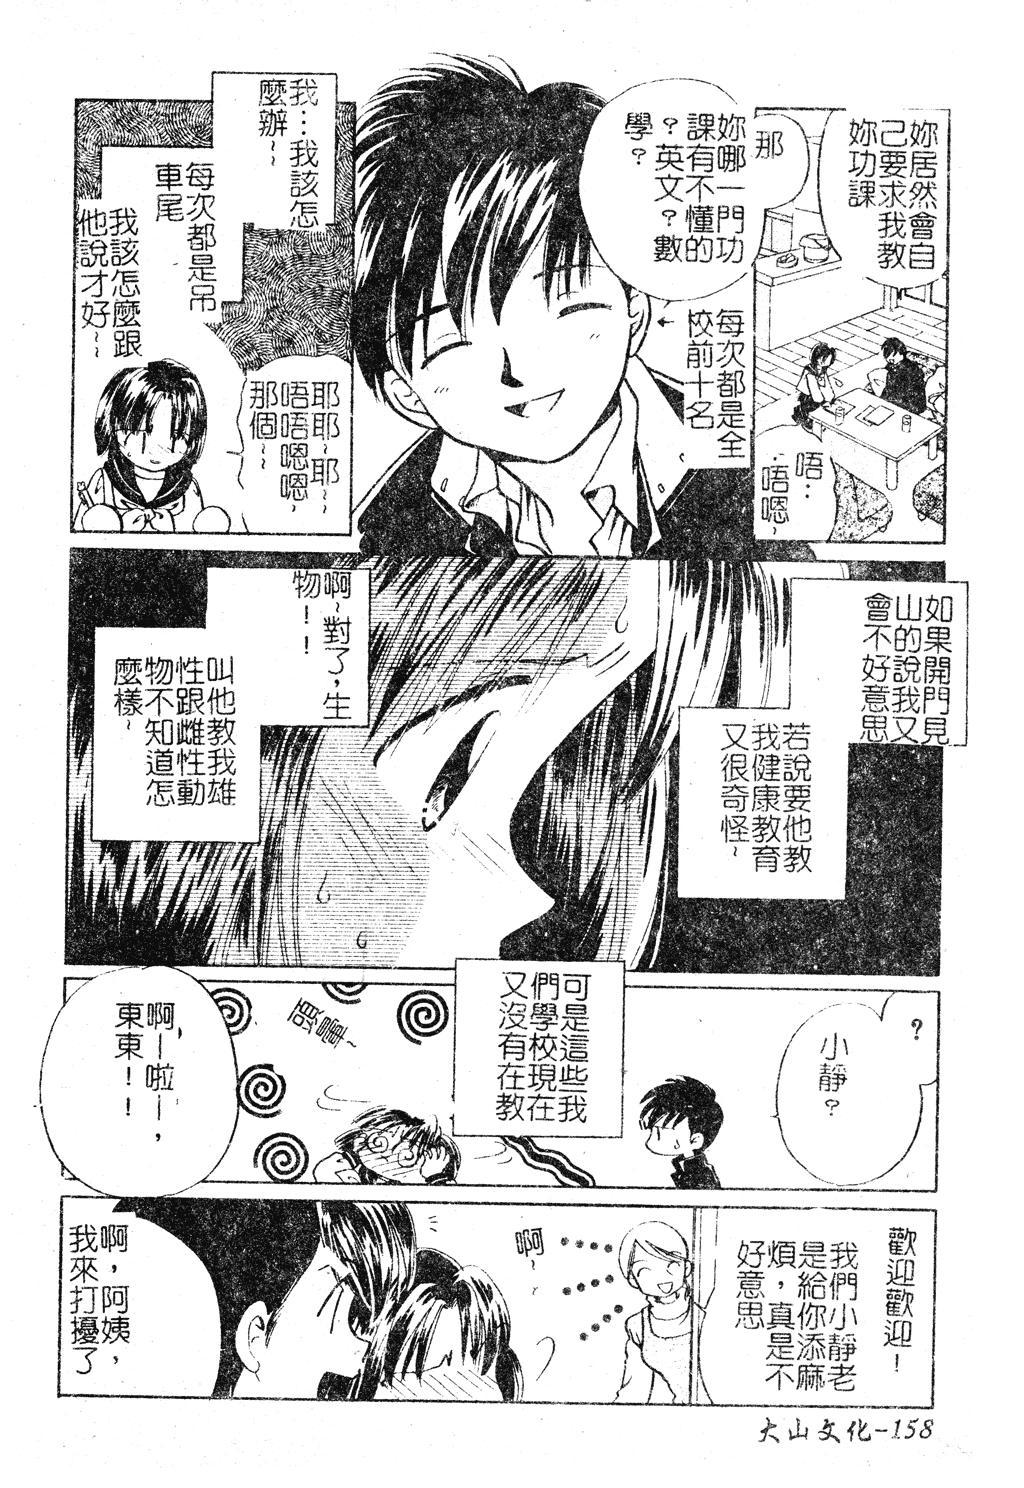 DenNow Koihime Collection 7 156